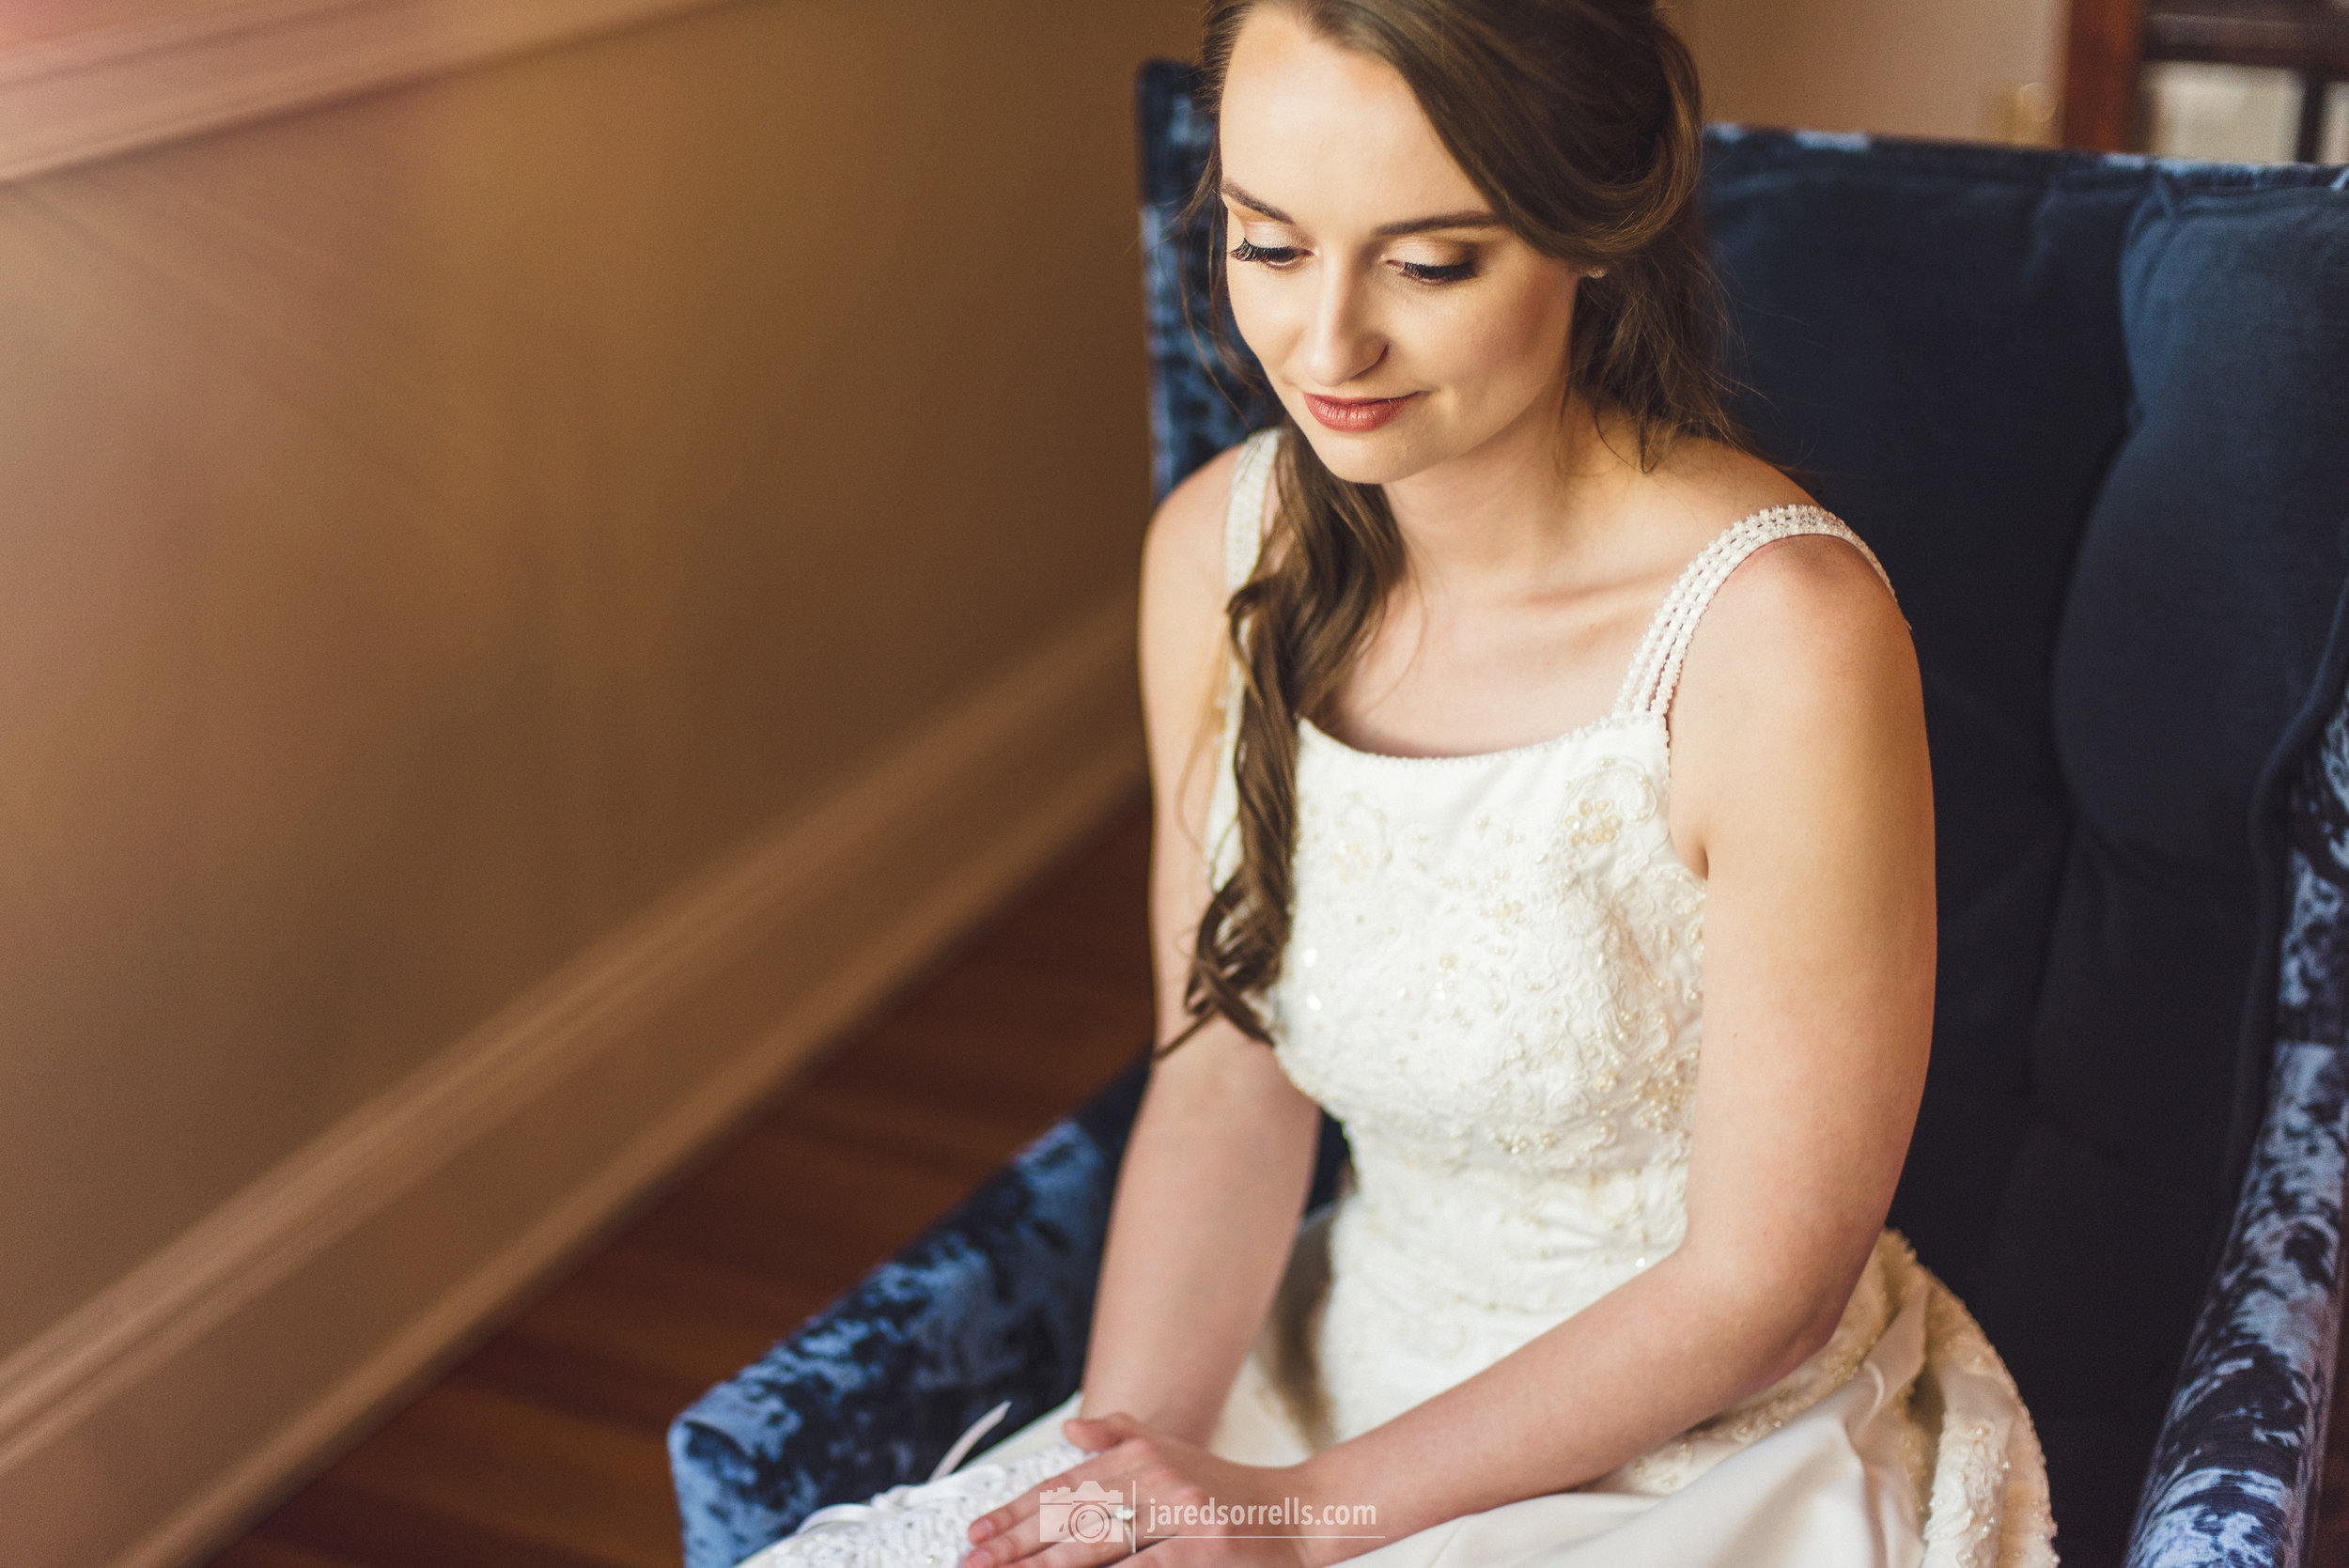 Paige's Bridals-8885-Edit.jpg